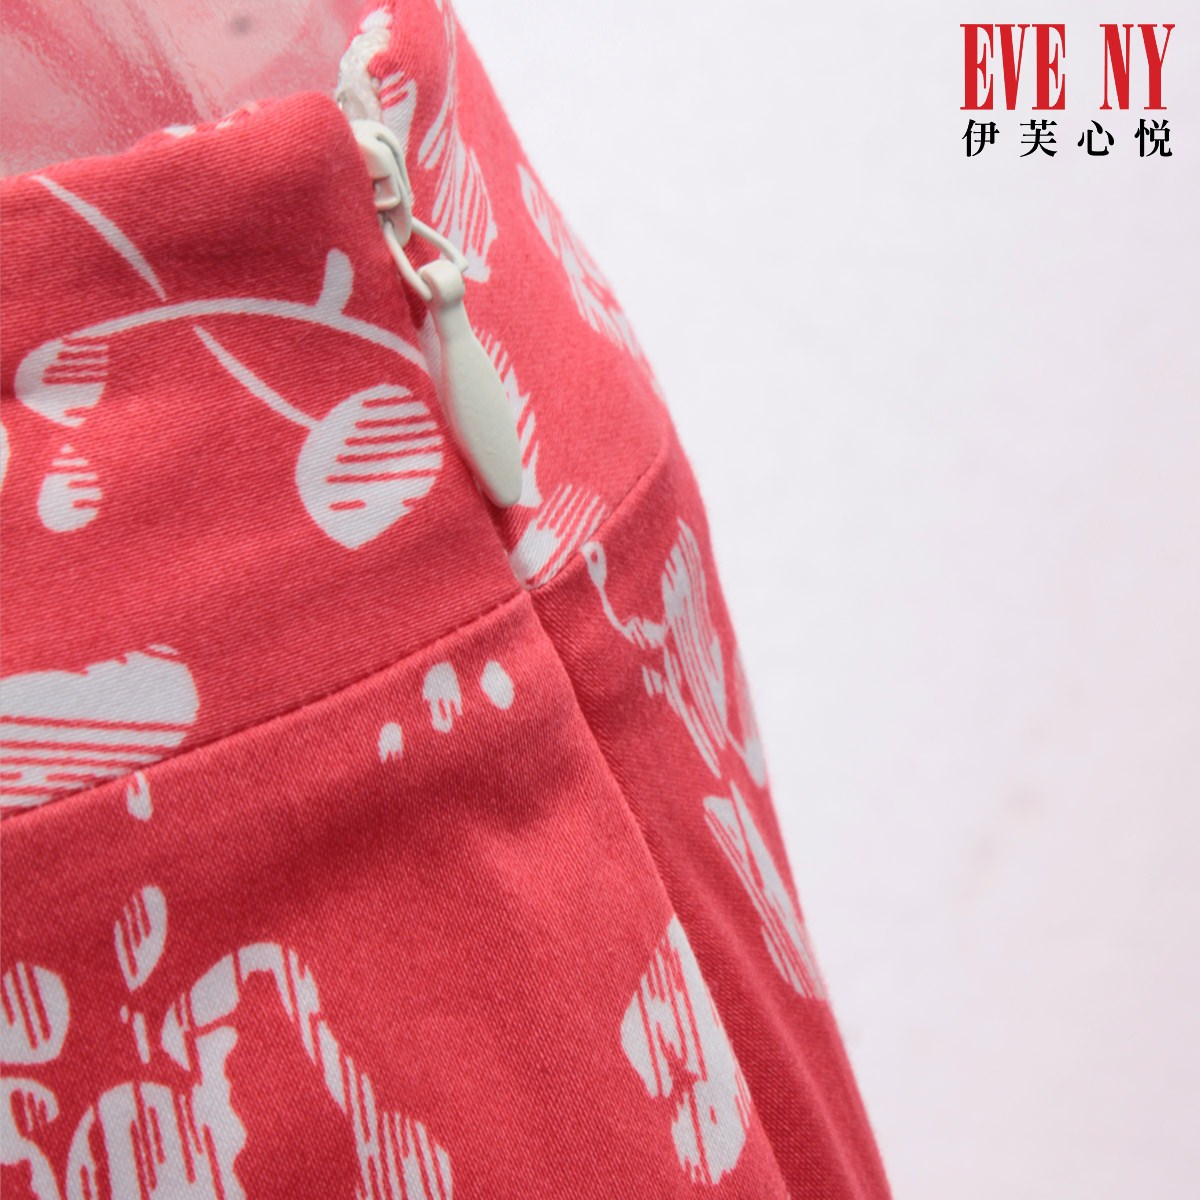 EVE'NY / Eve Moods